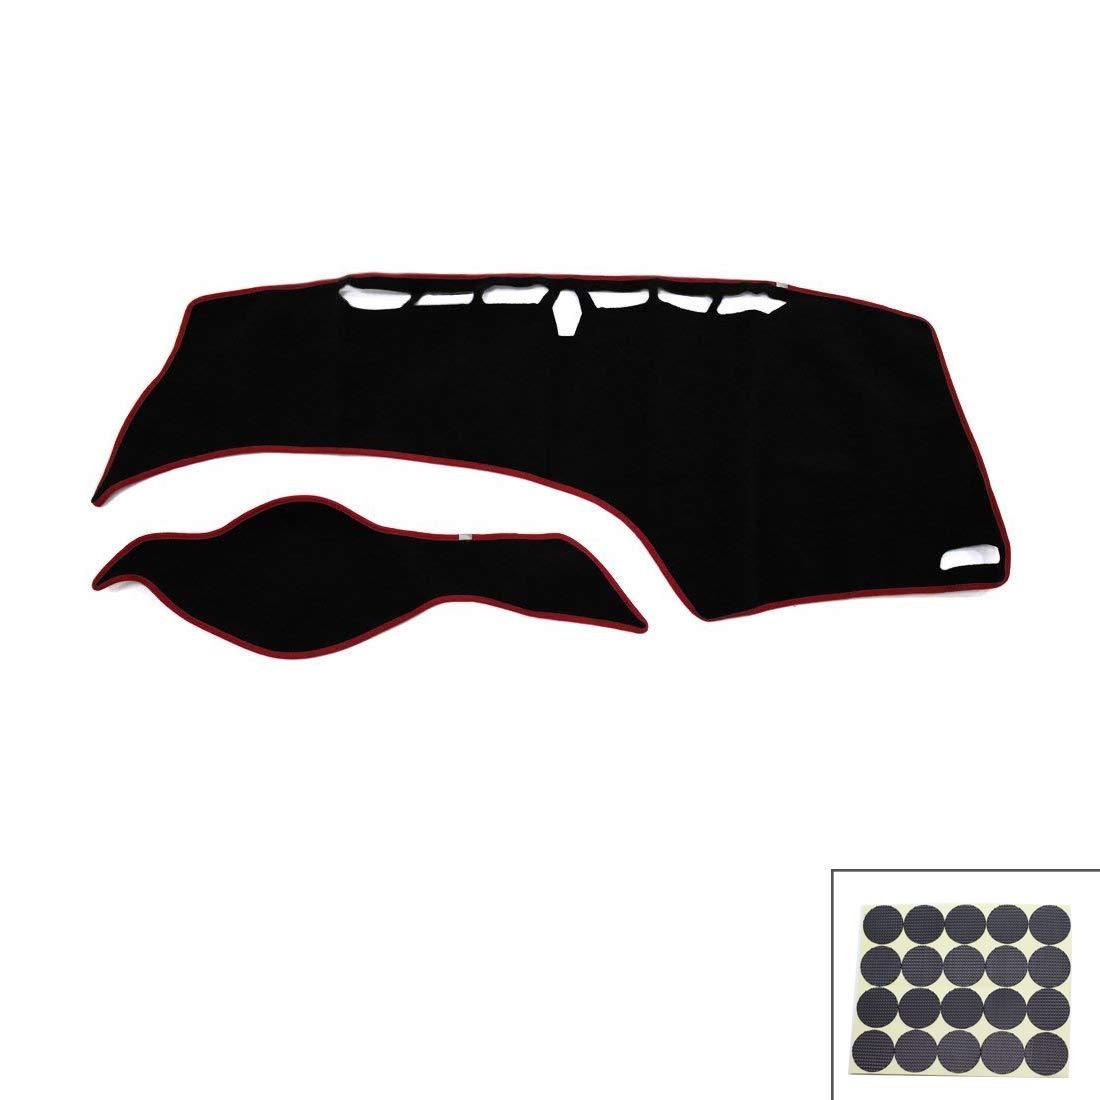 Autoly Black Dashboard Cover Shield Sun Carpet Pad Custom for 2012-2015 9th Gen Honda Civic